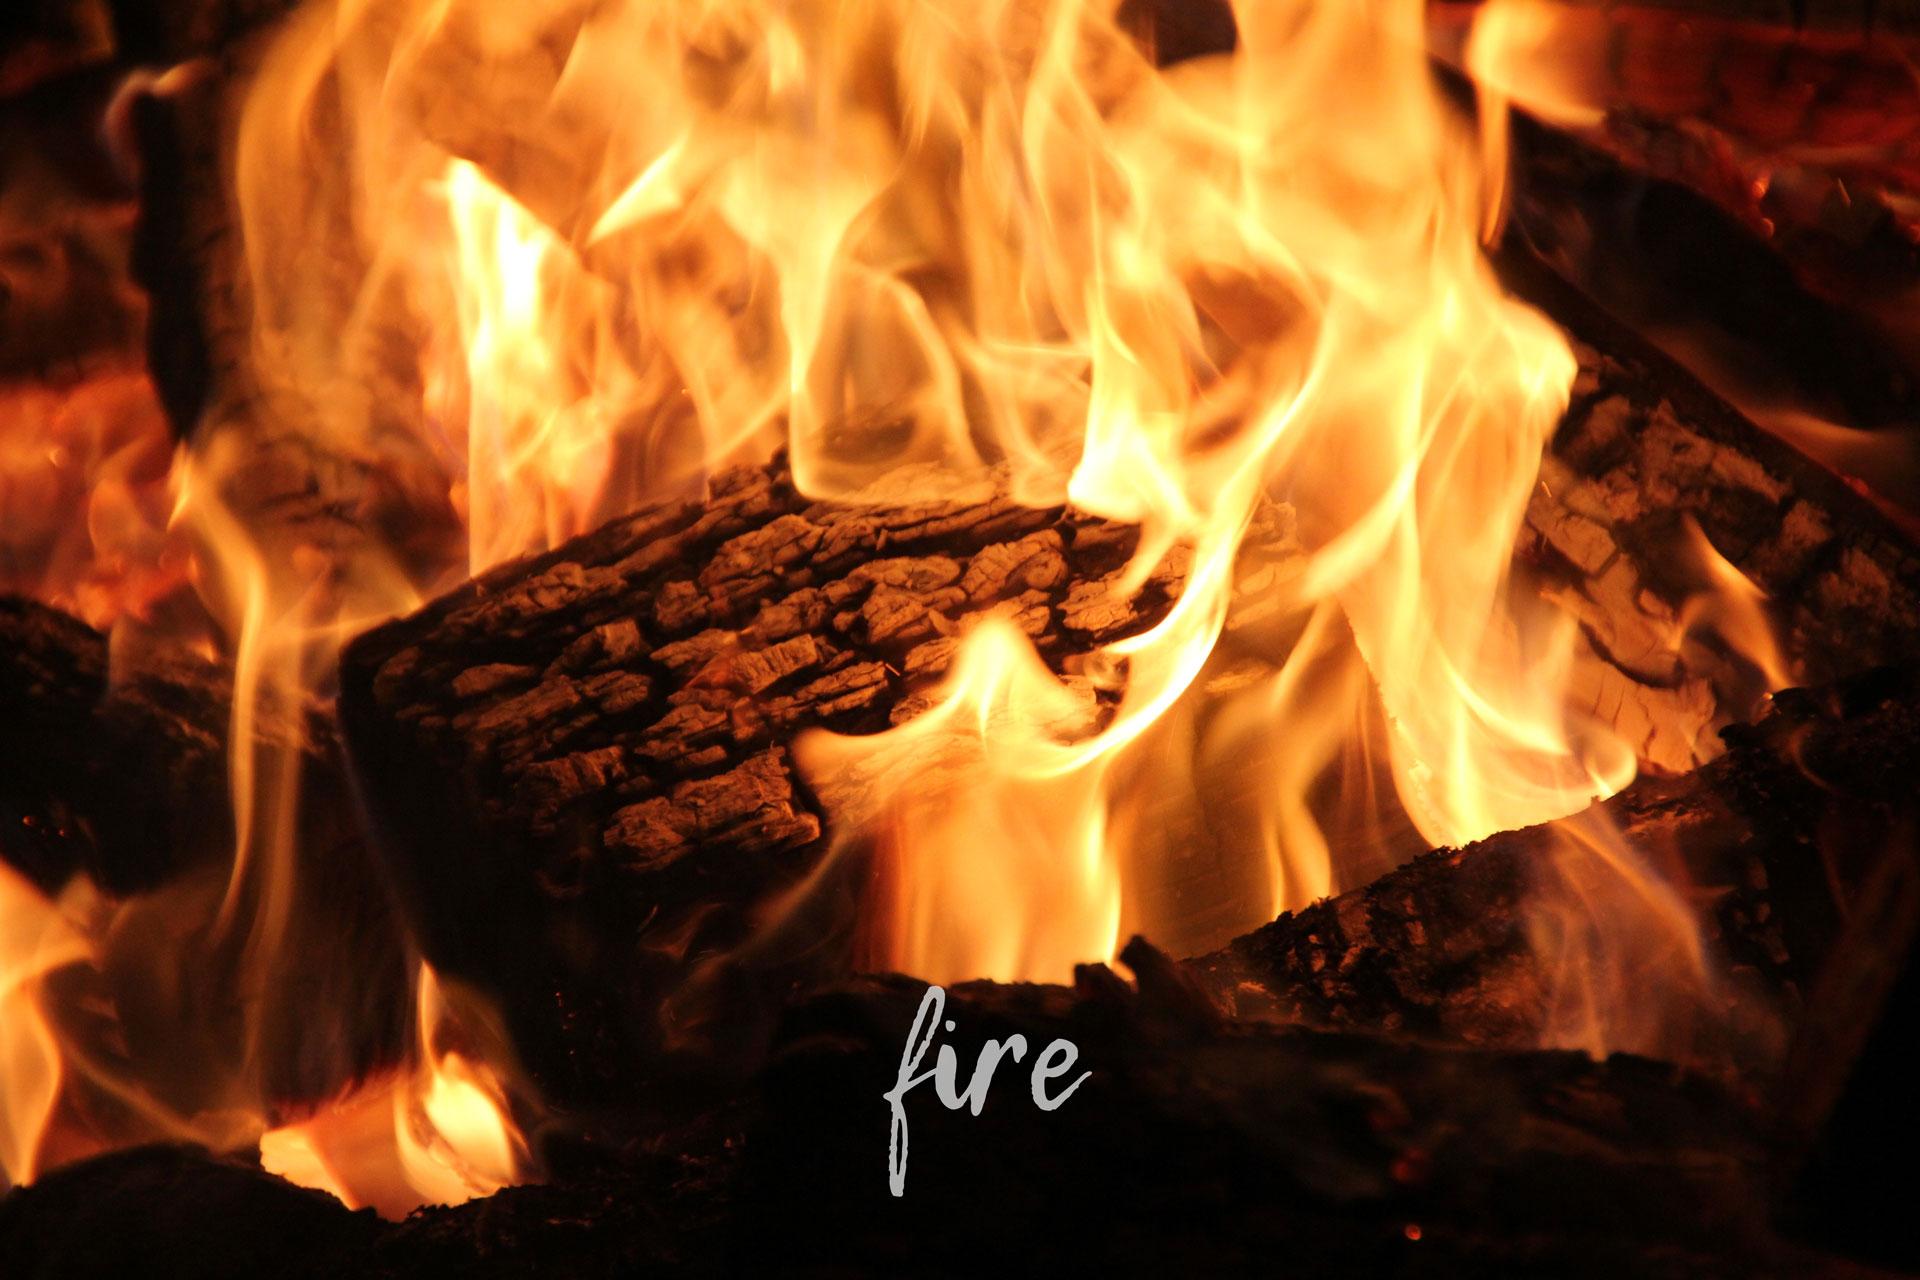 Melanie-McHale-fire